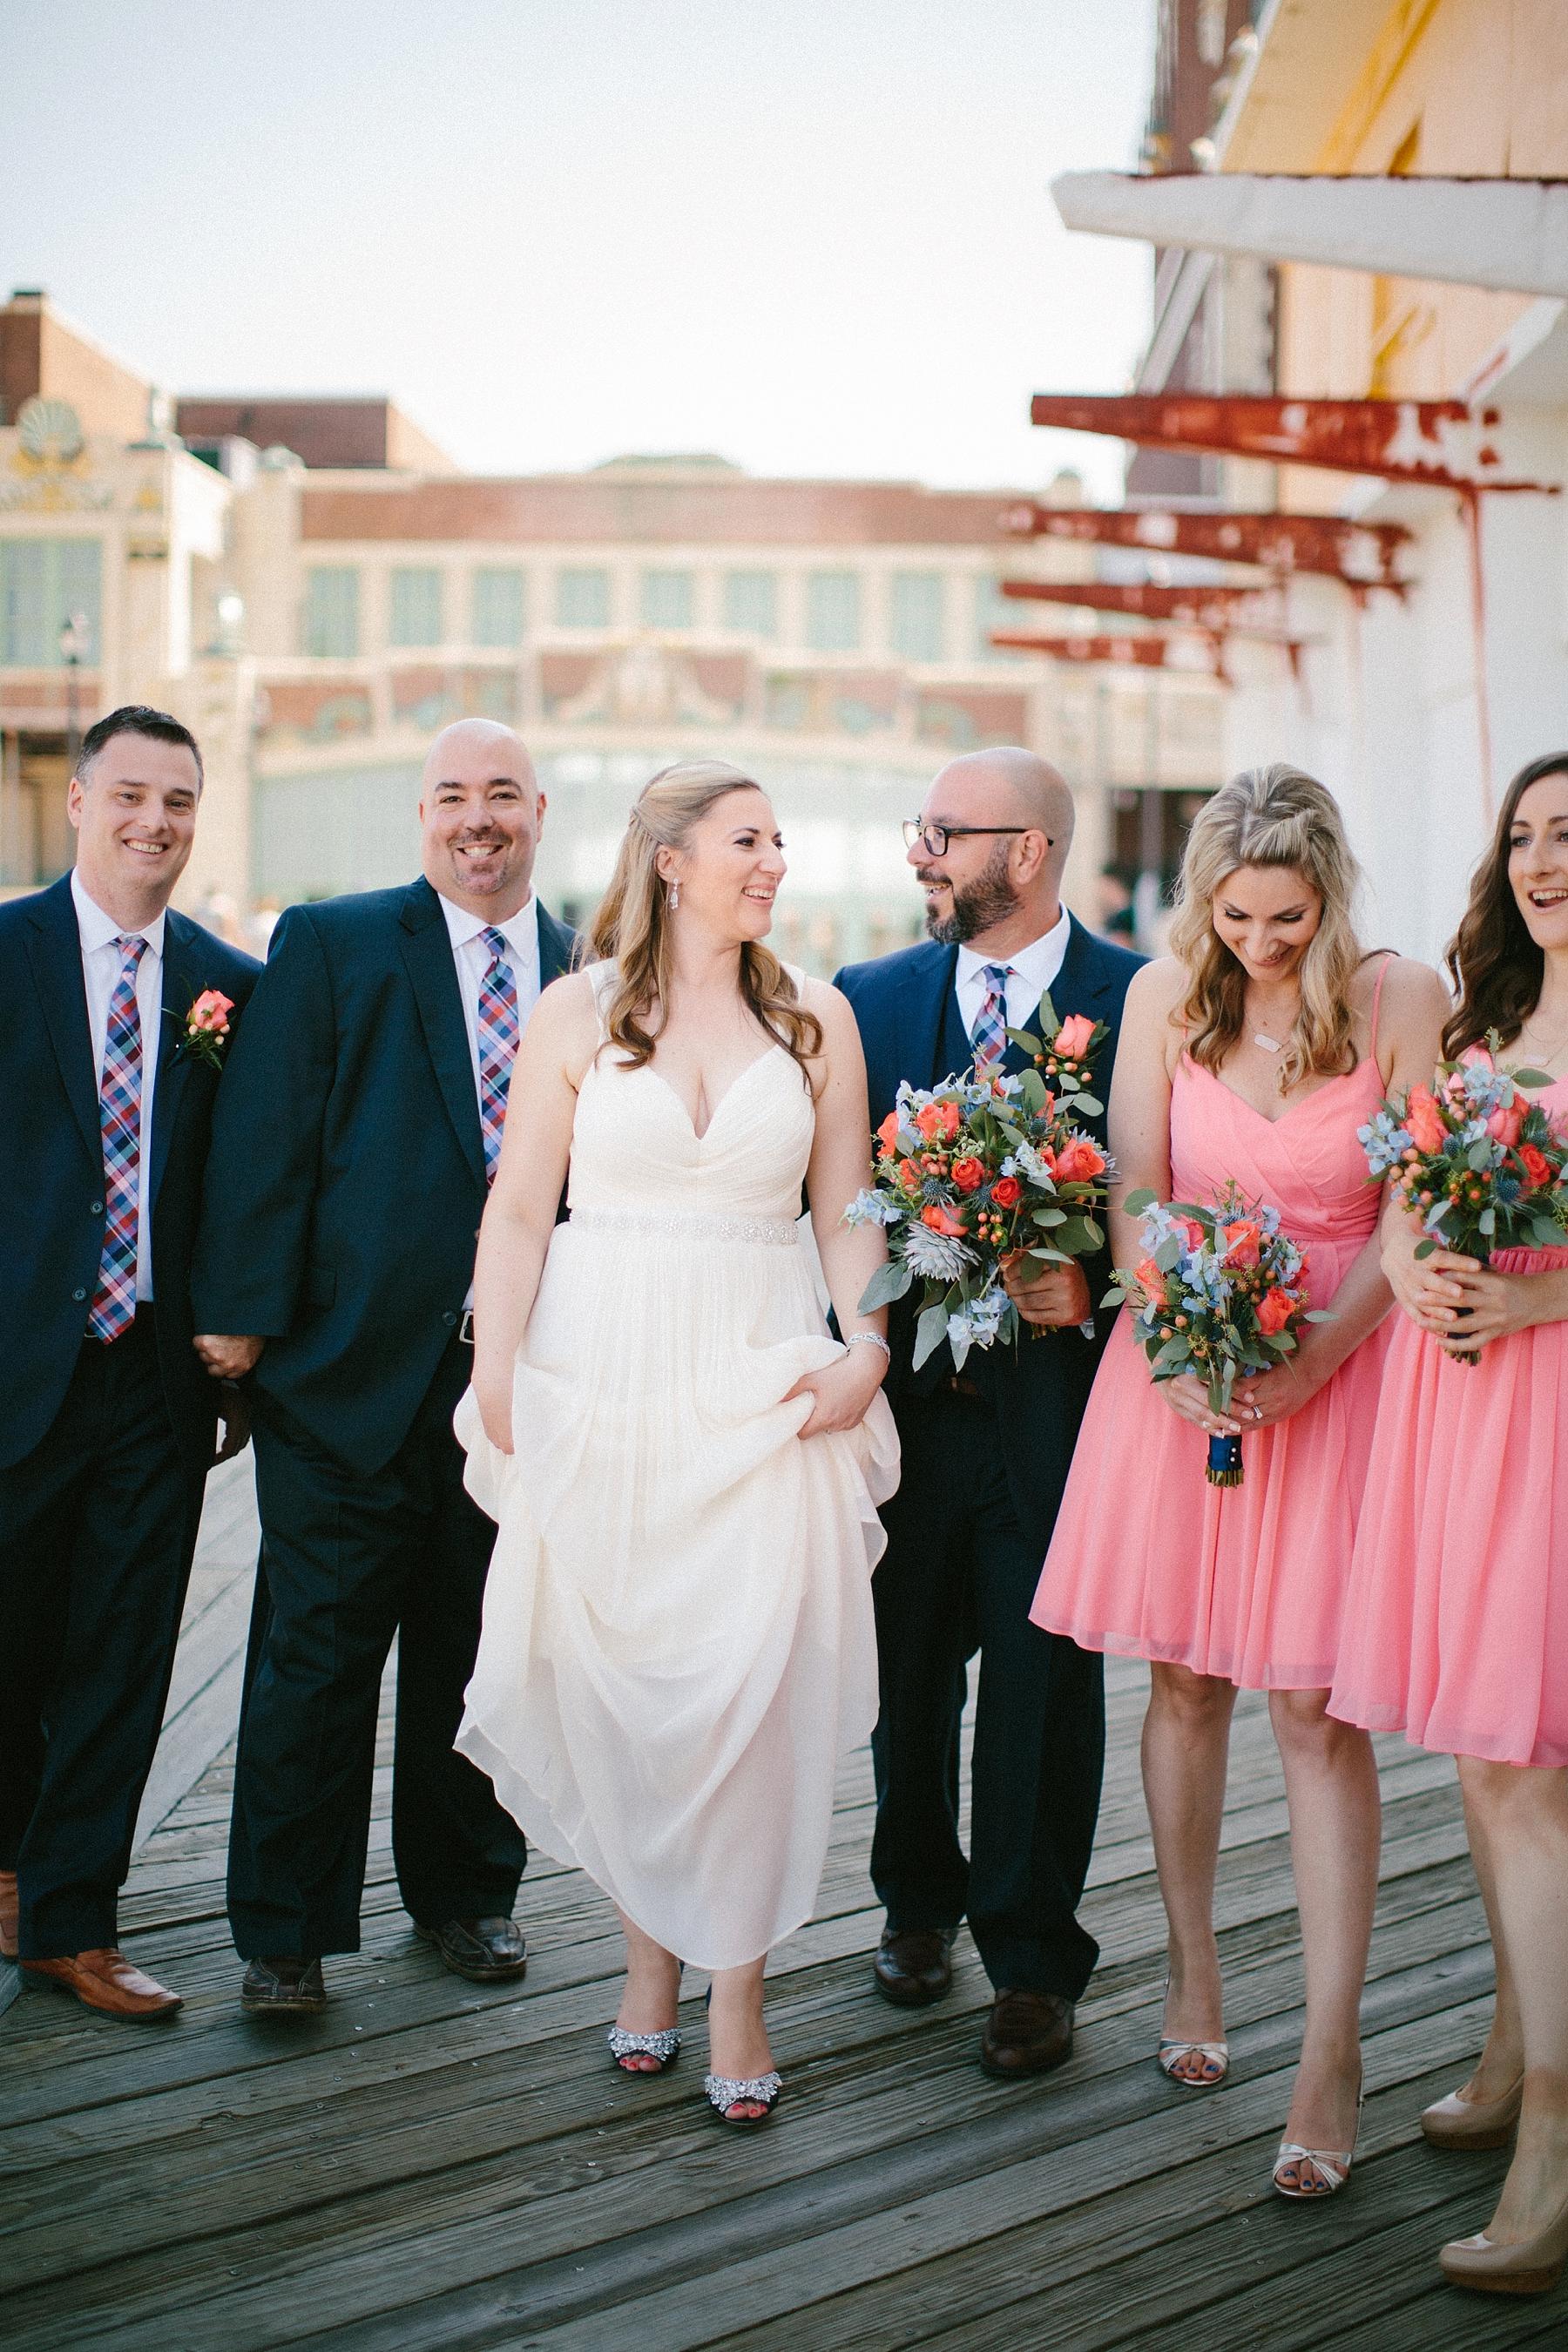 asbury-park-nj-wedding-salt-creek-grill_0016.jpg